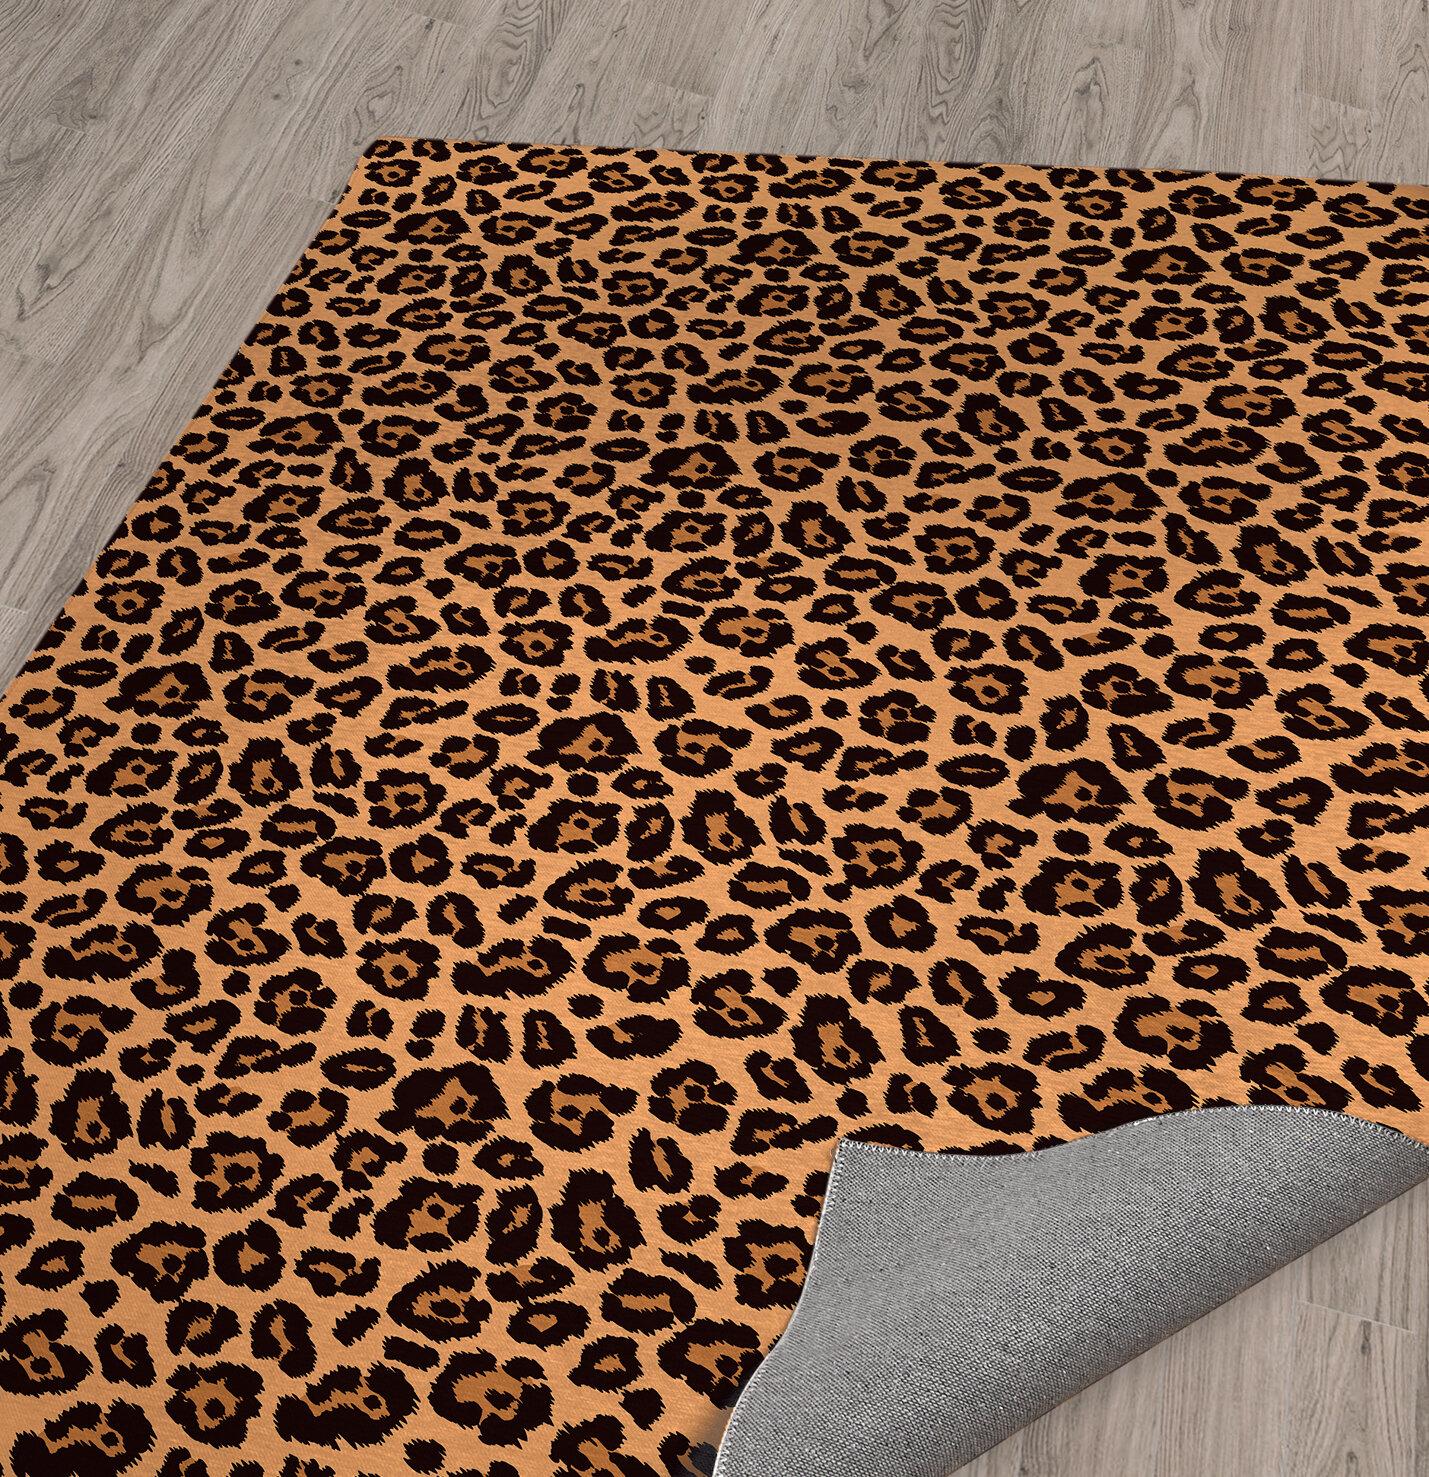 9 X 12 Animal Print Area Rugs You Ll Love In 2021 Wayfair